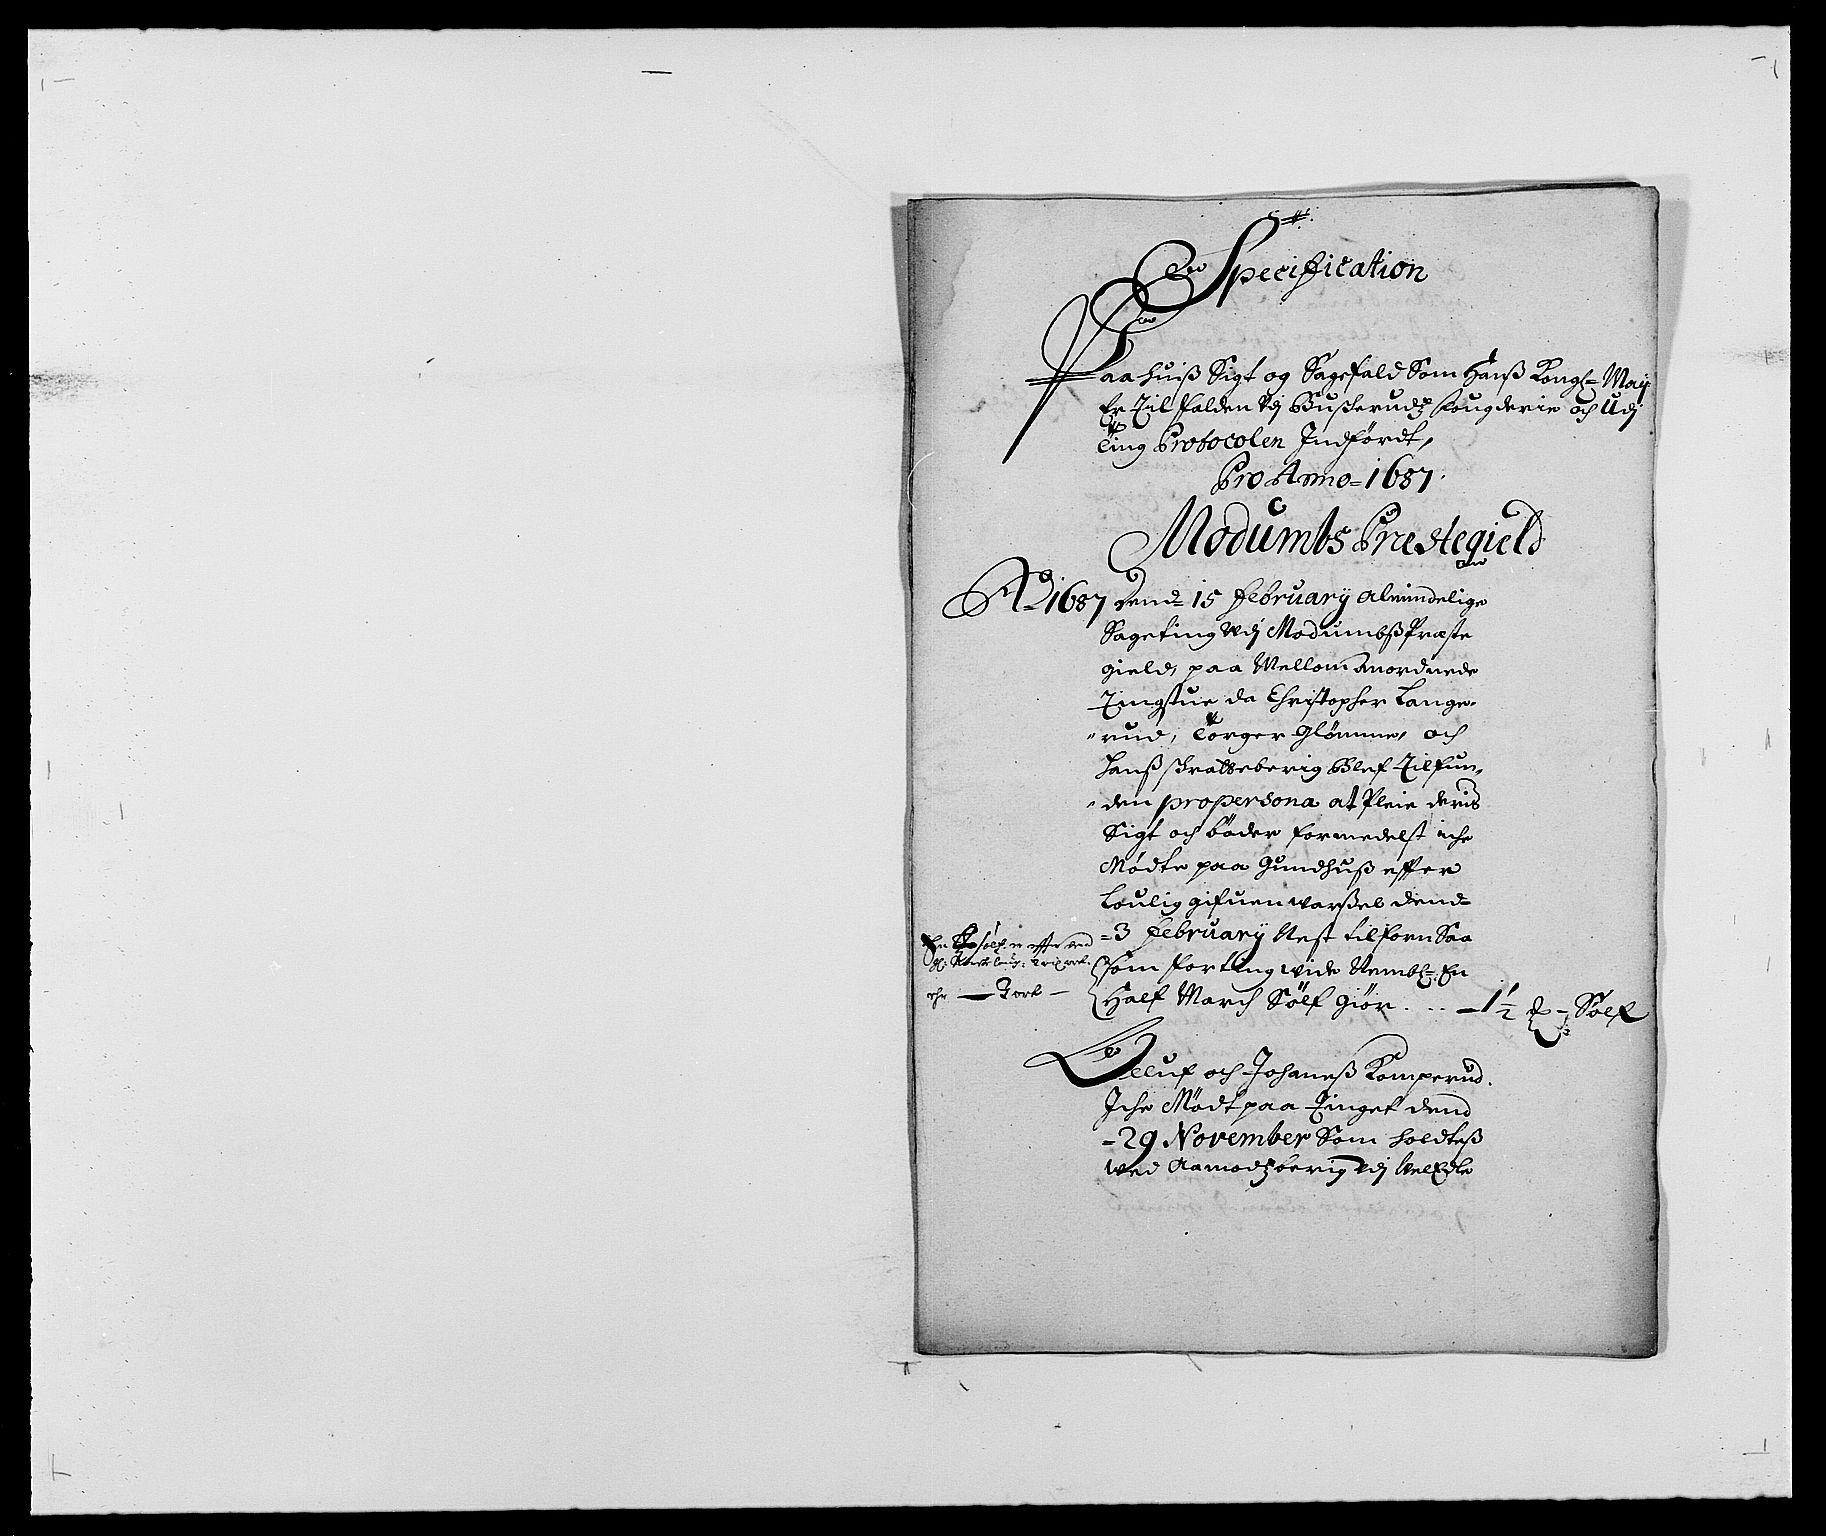 RA, Rentekammeret inntil 1814, Reviderte regnskaper, Fogderegnskap, R25/L1679: Fogderegnskap Buskerud, 1687-1688, s. 68